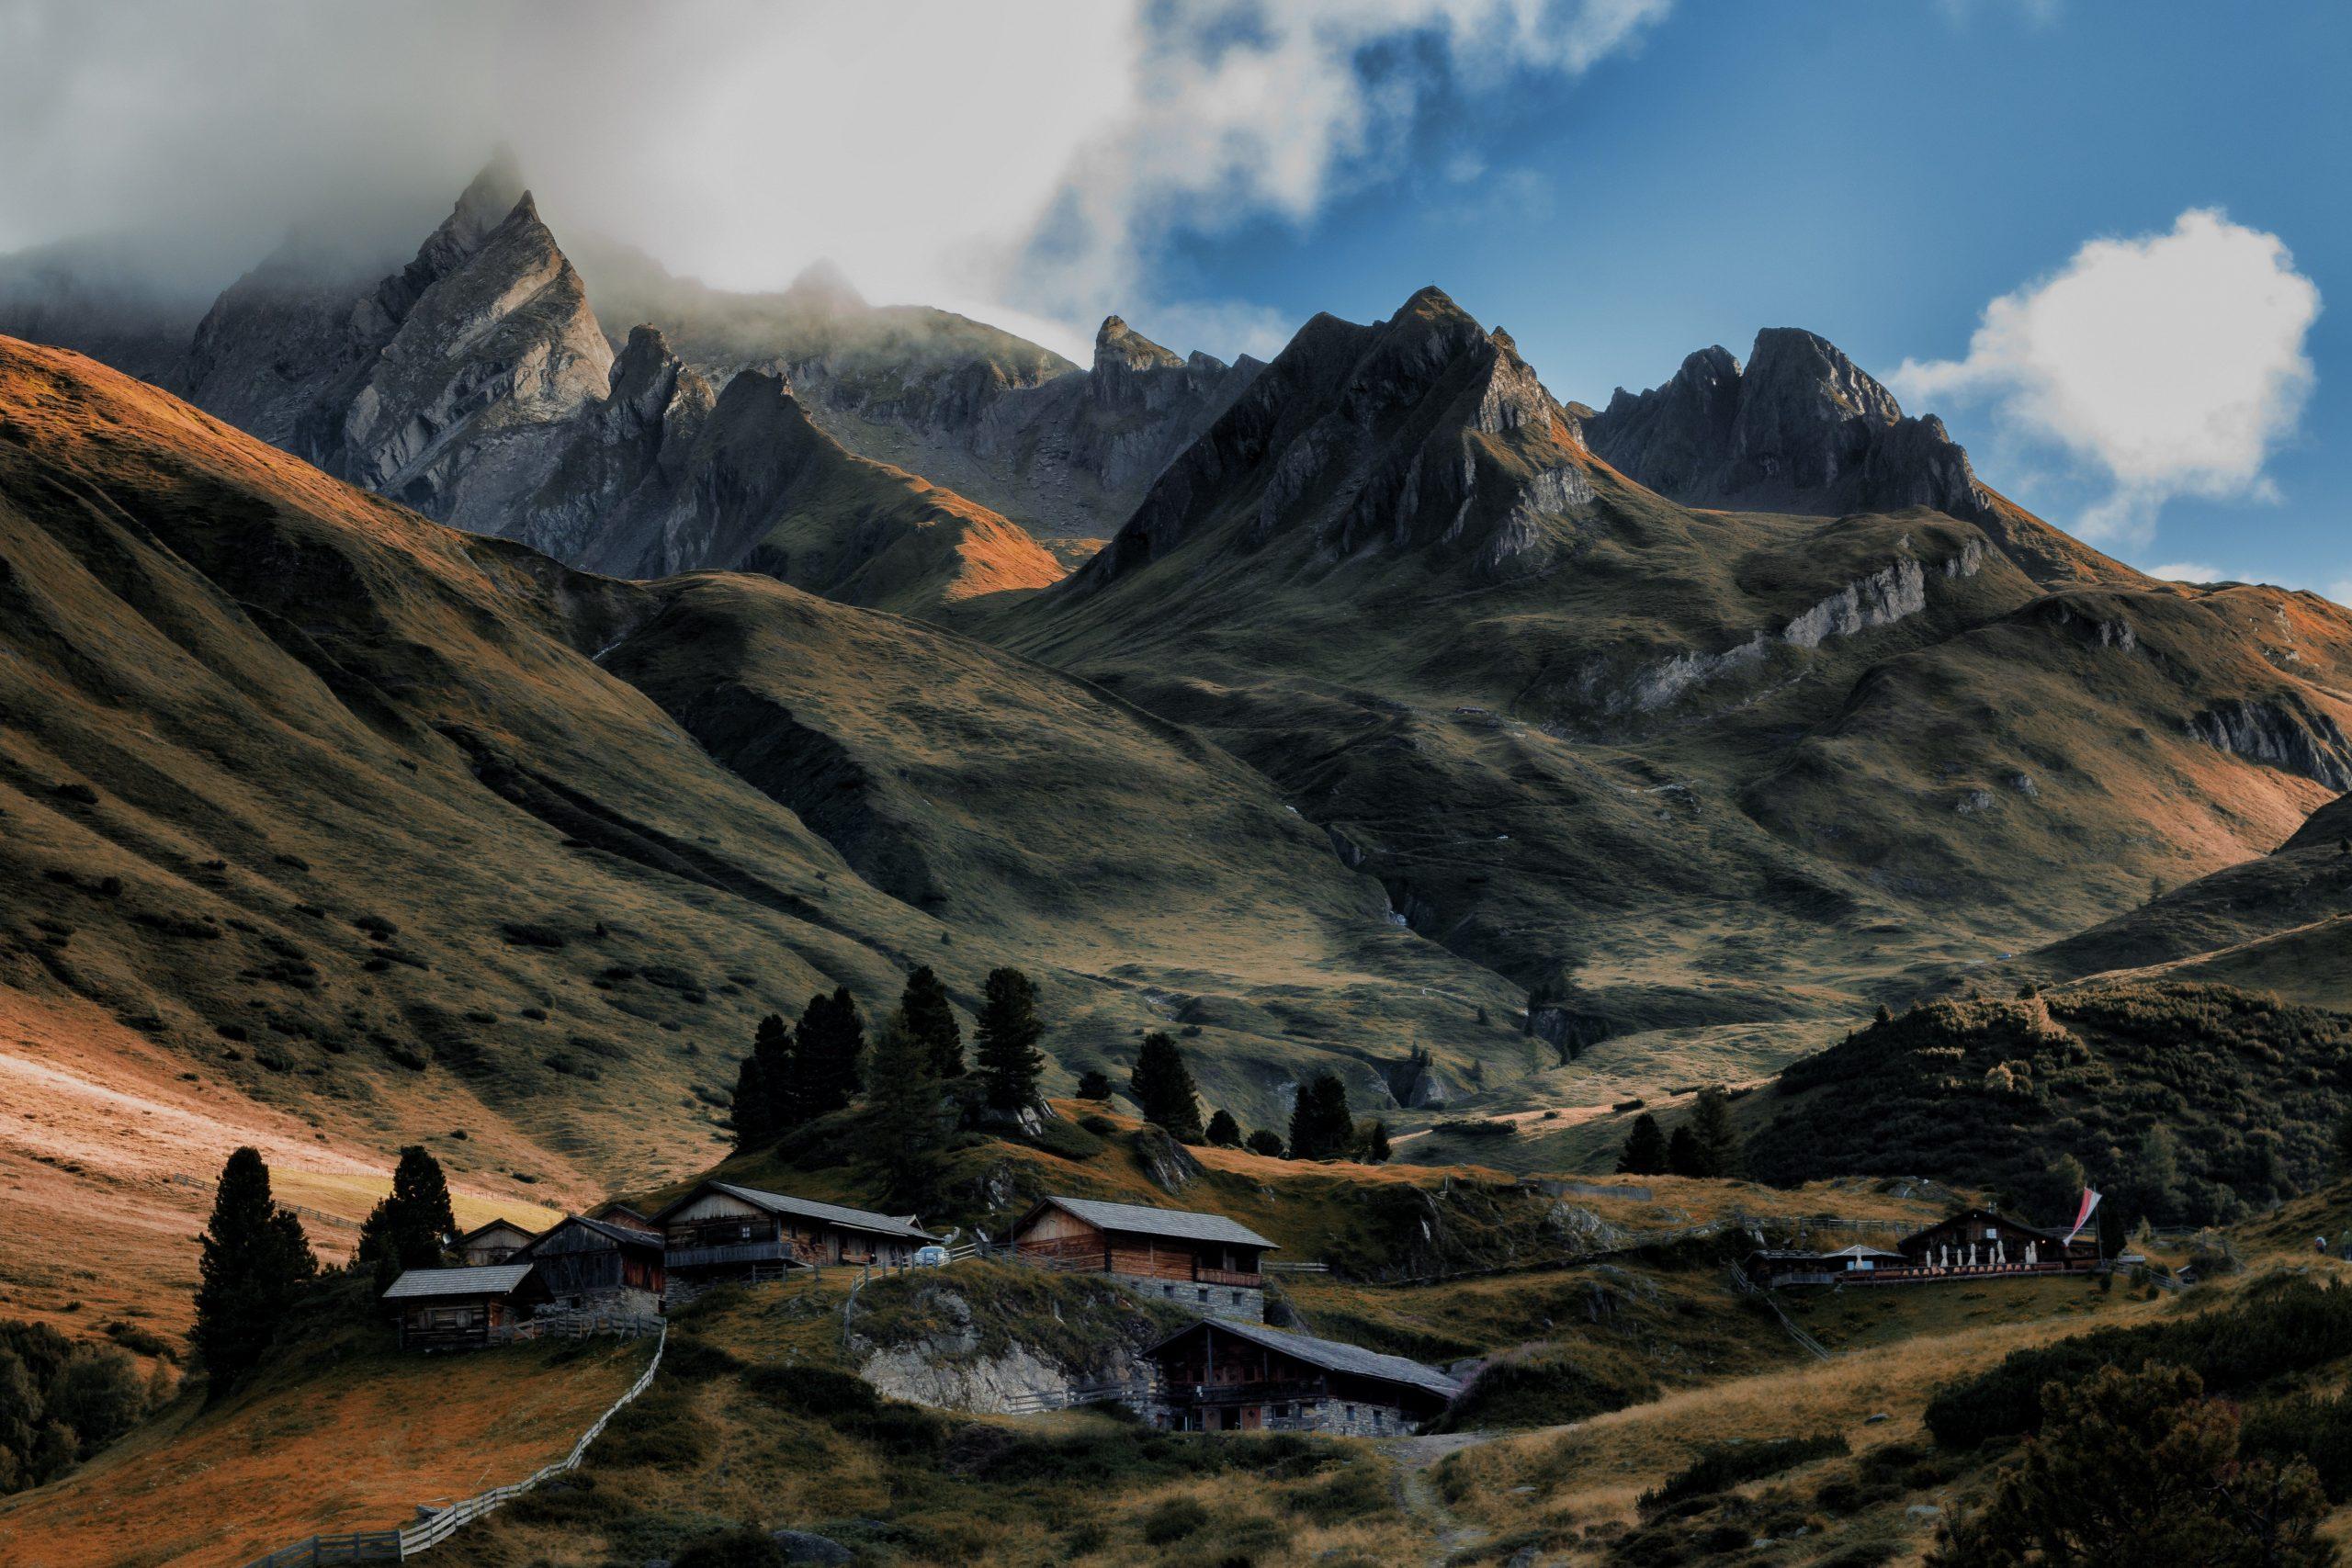 Hidden Magical Village Of Dolpa